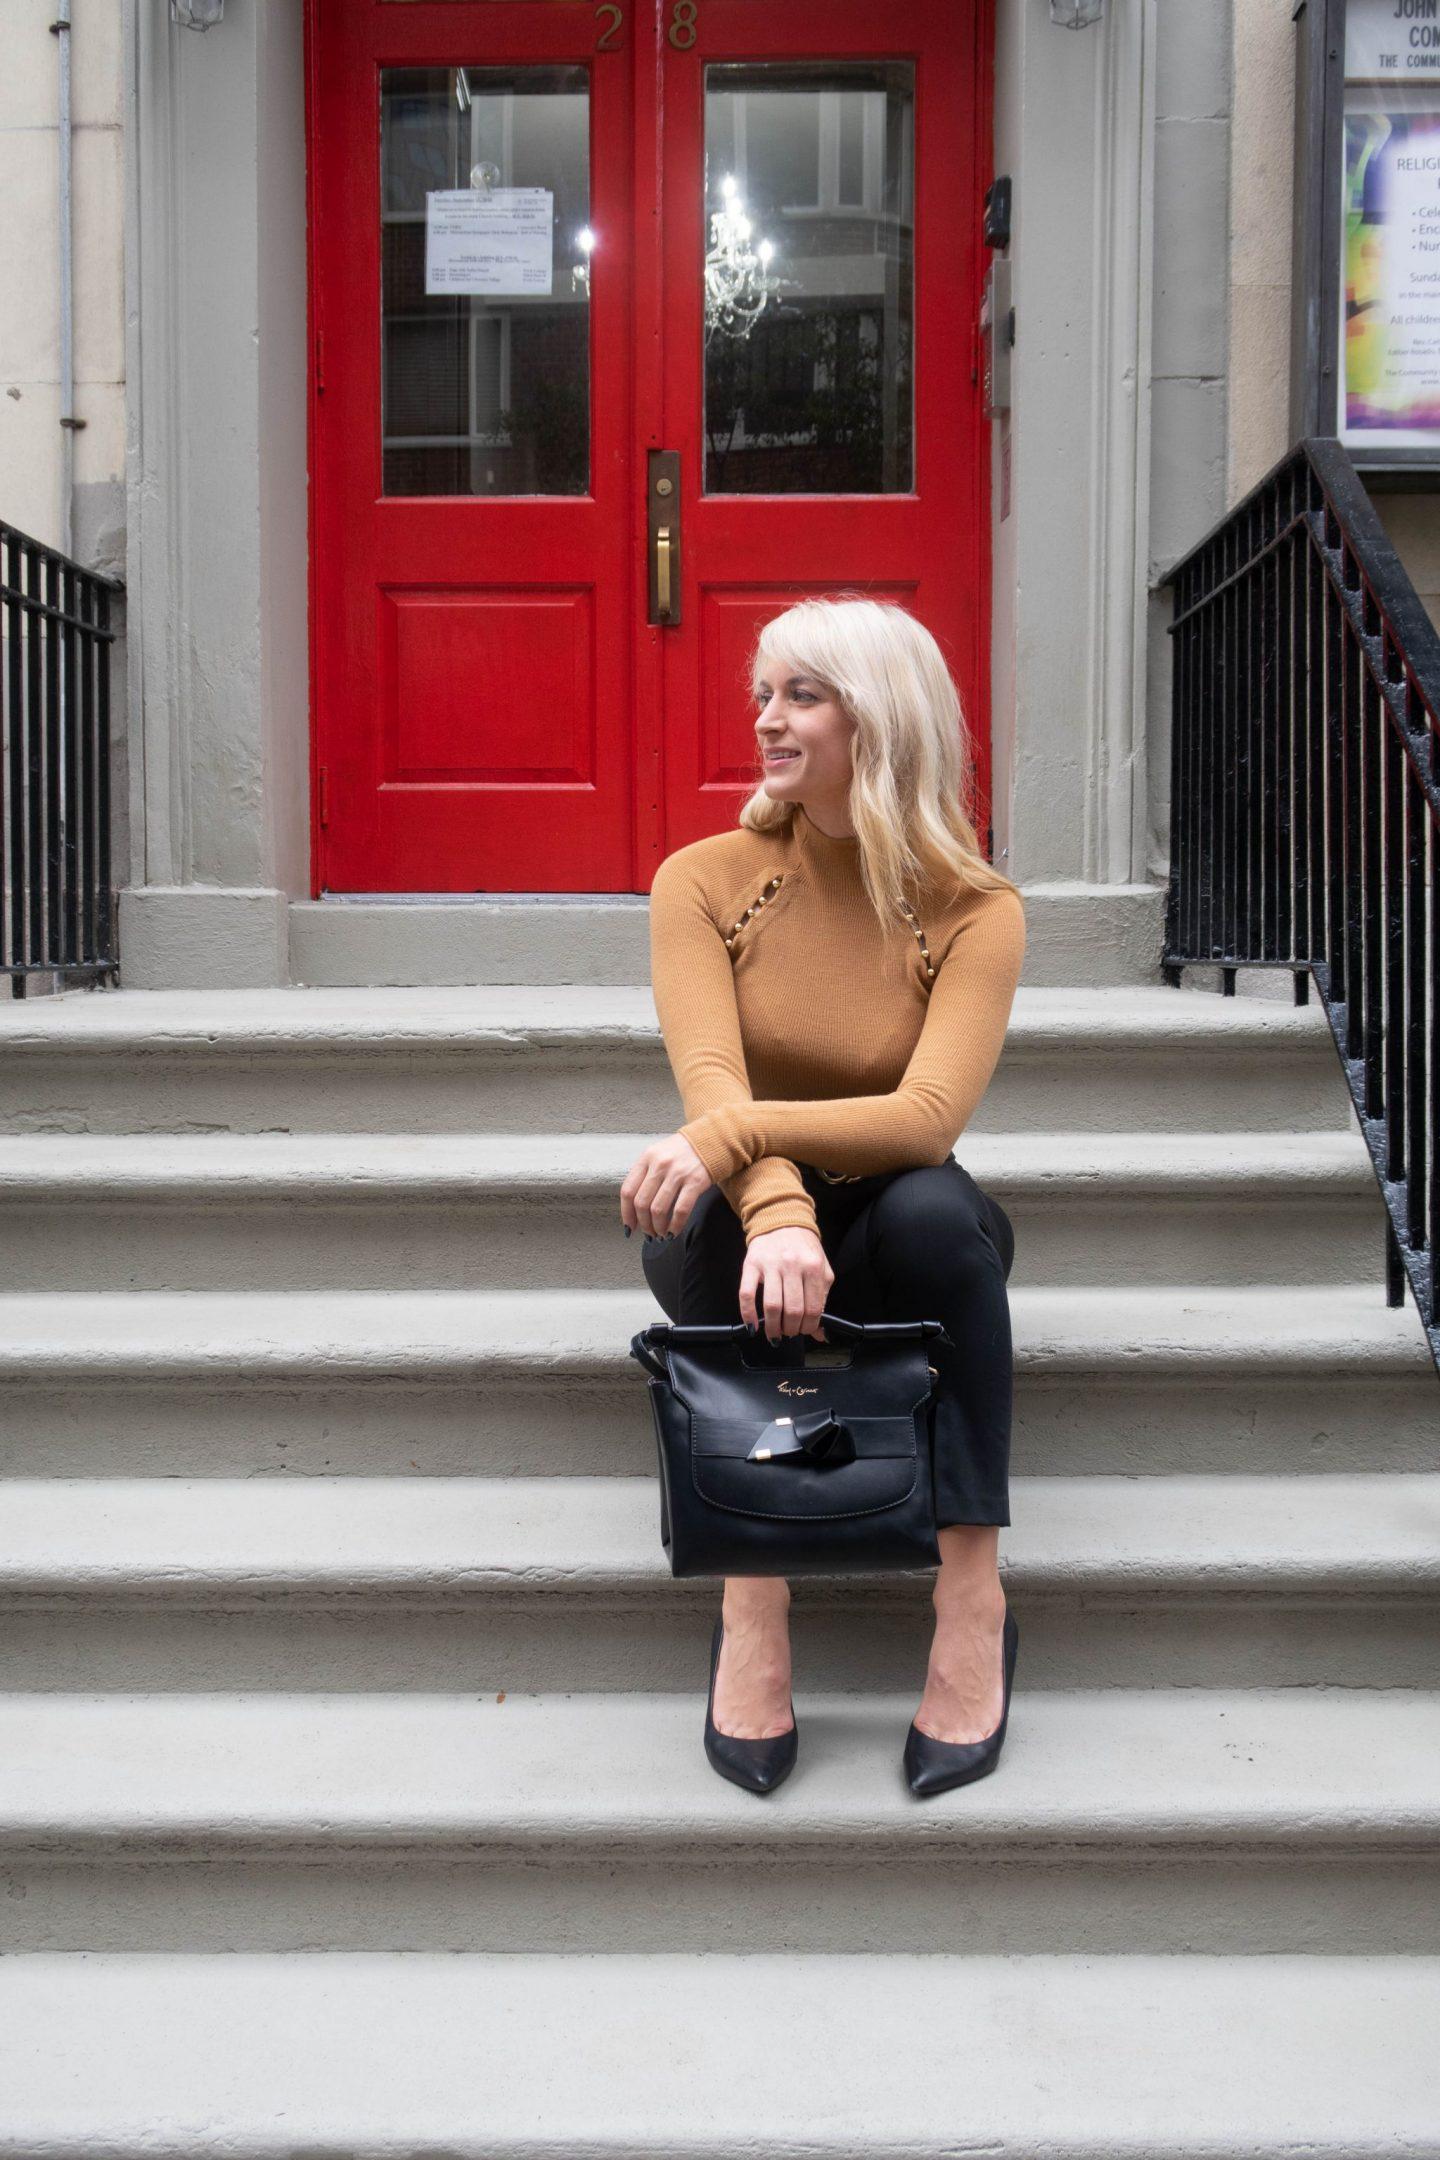 legallee blonde sitting holding a foley & corinna handbag